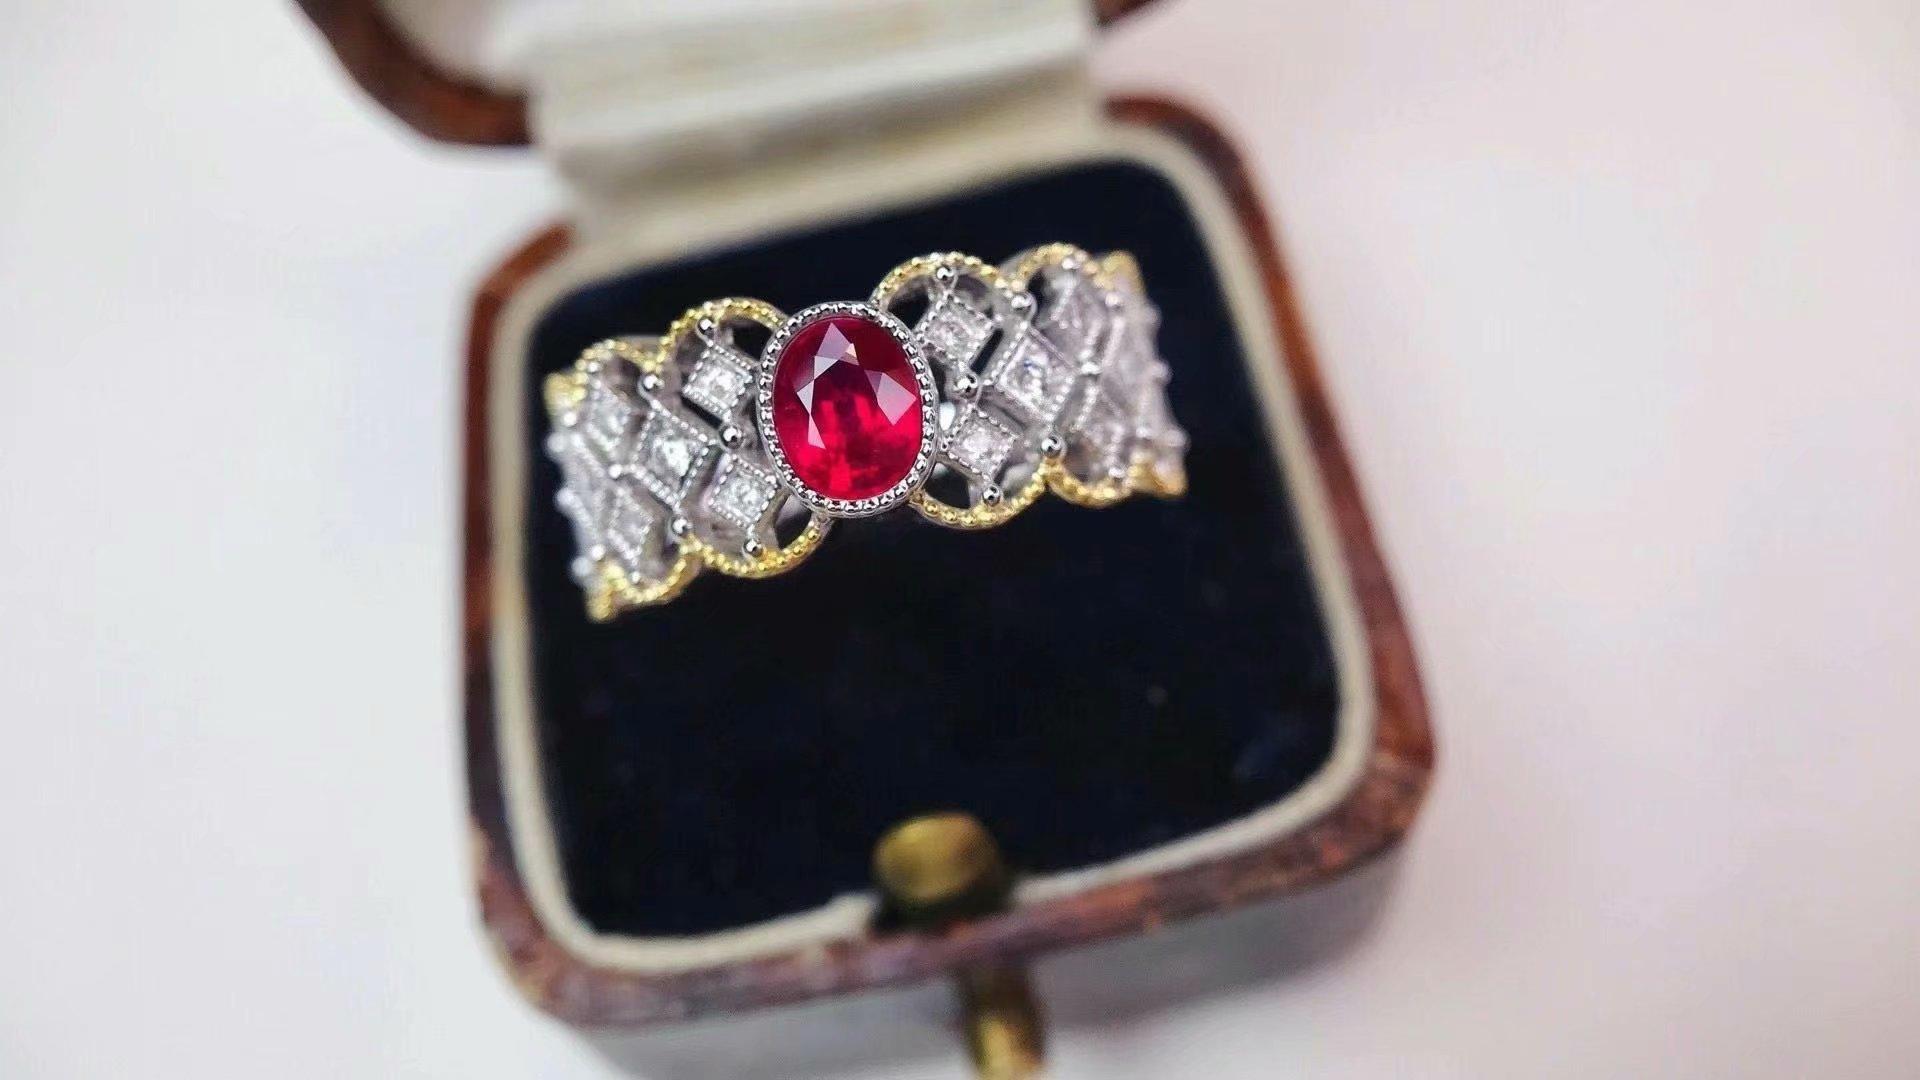 18K白金配进口南非钻石镶嵌女款 0.54克拉天然红宝石戒指真金真钻